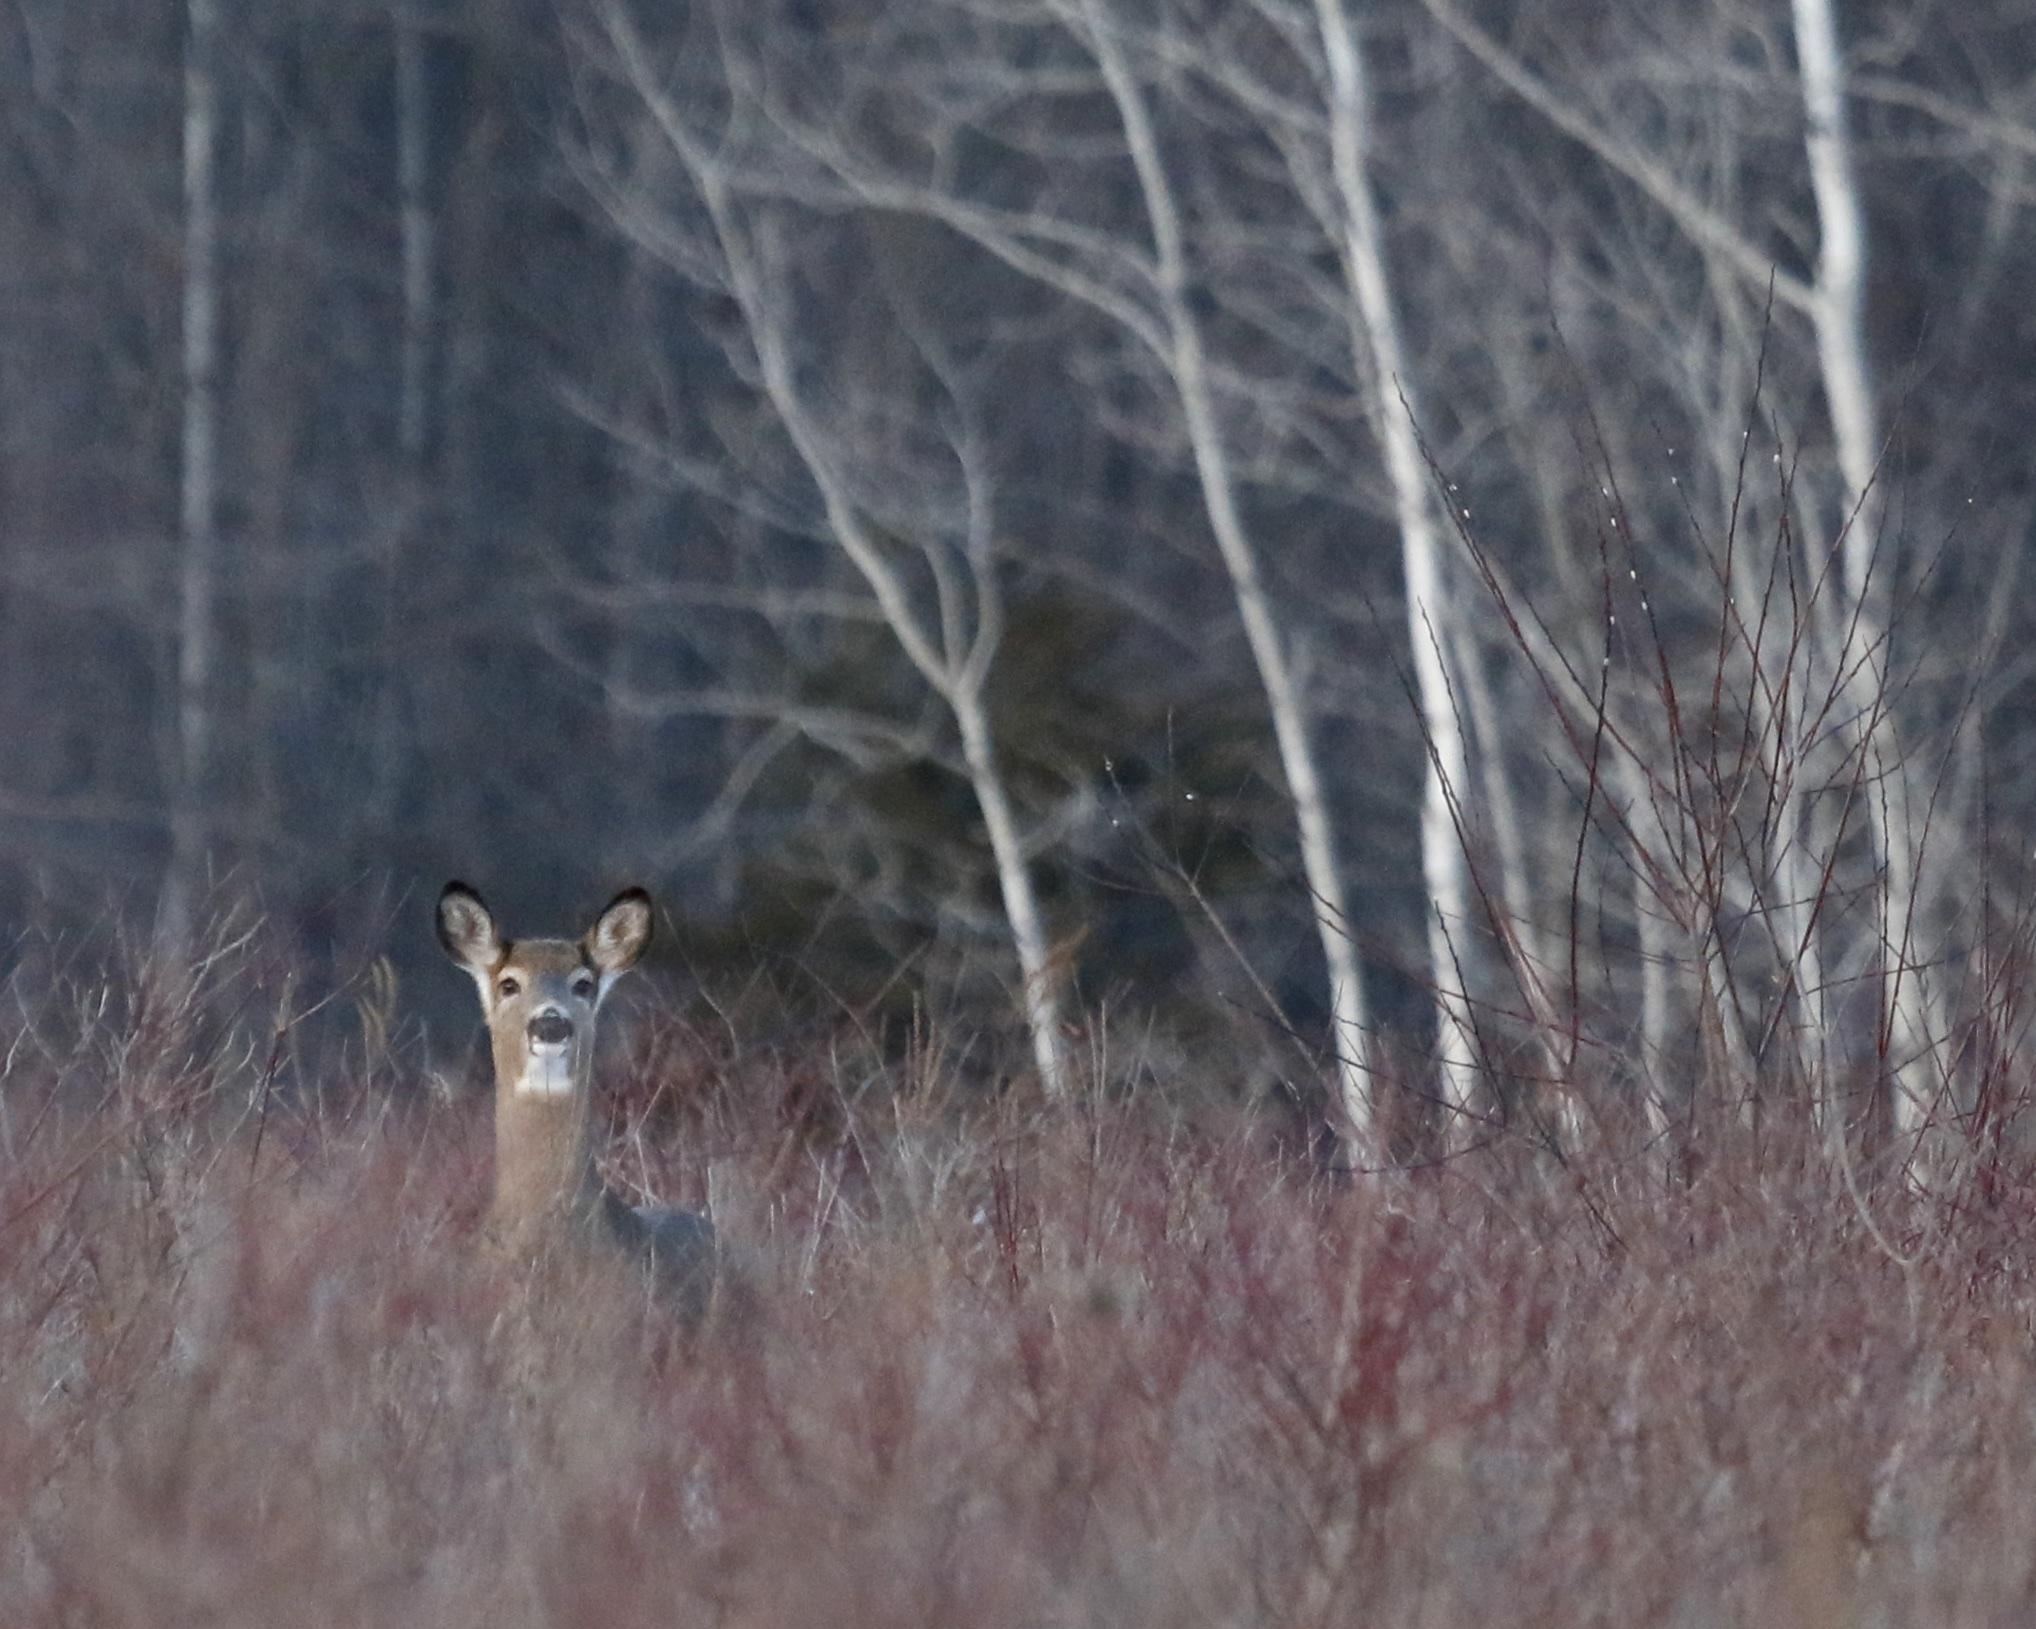 ~A deer checks things out at the Shawangunk Grasslands, 1/17/15.~